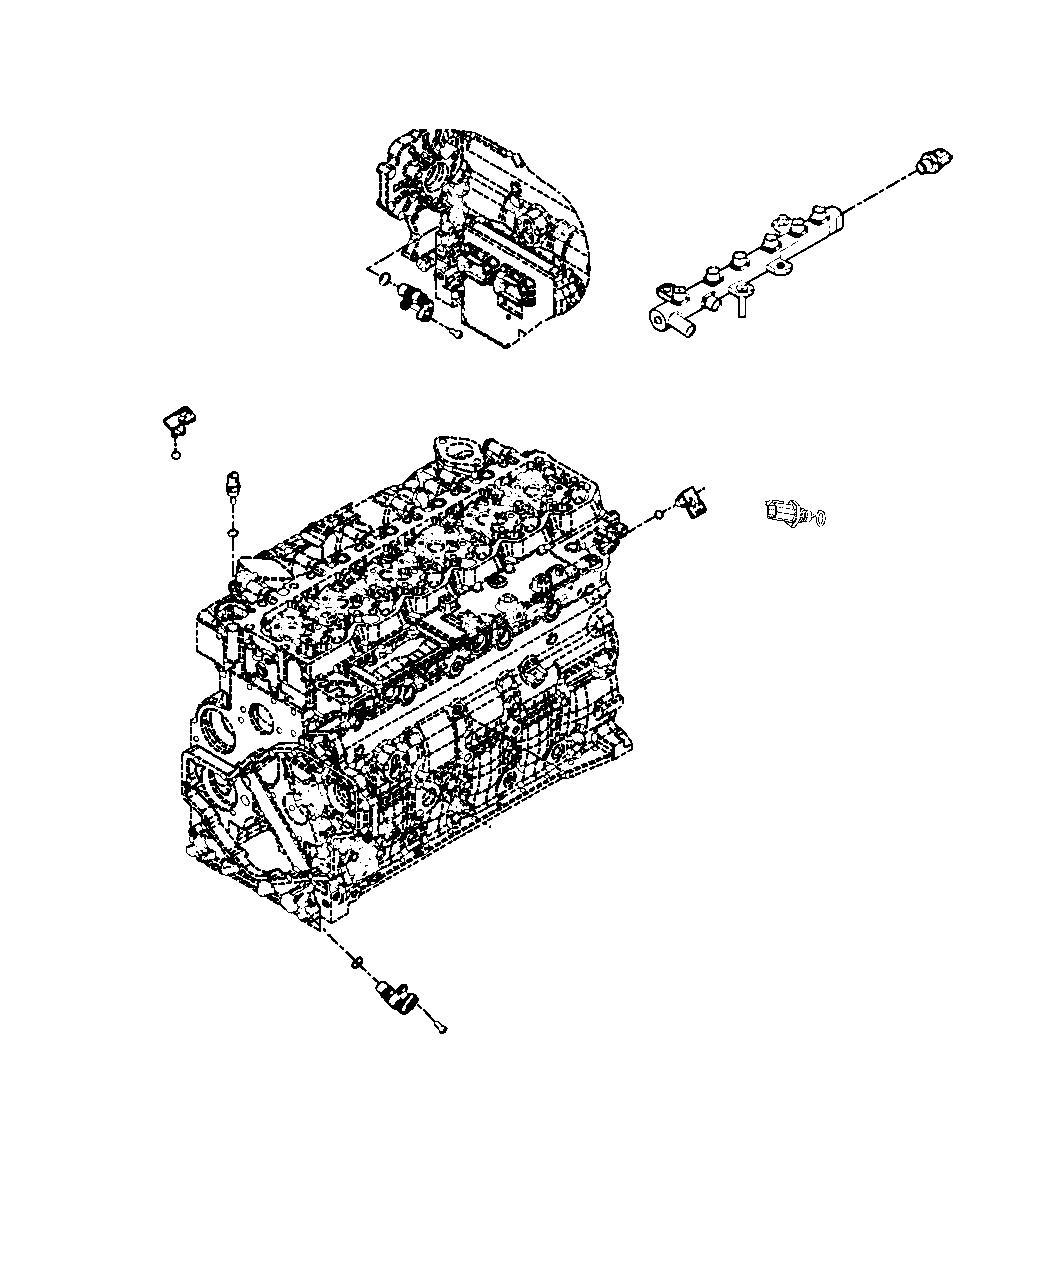 Cummins Aftertreatment Fuel Pressure Sensor | Wiring Diagram Database